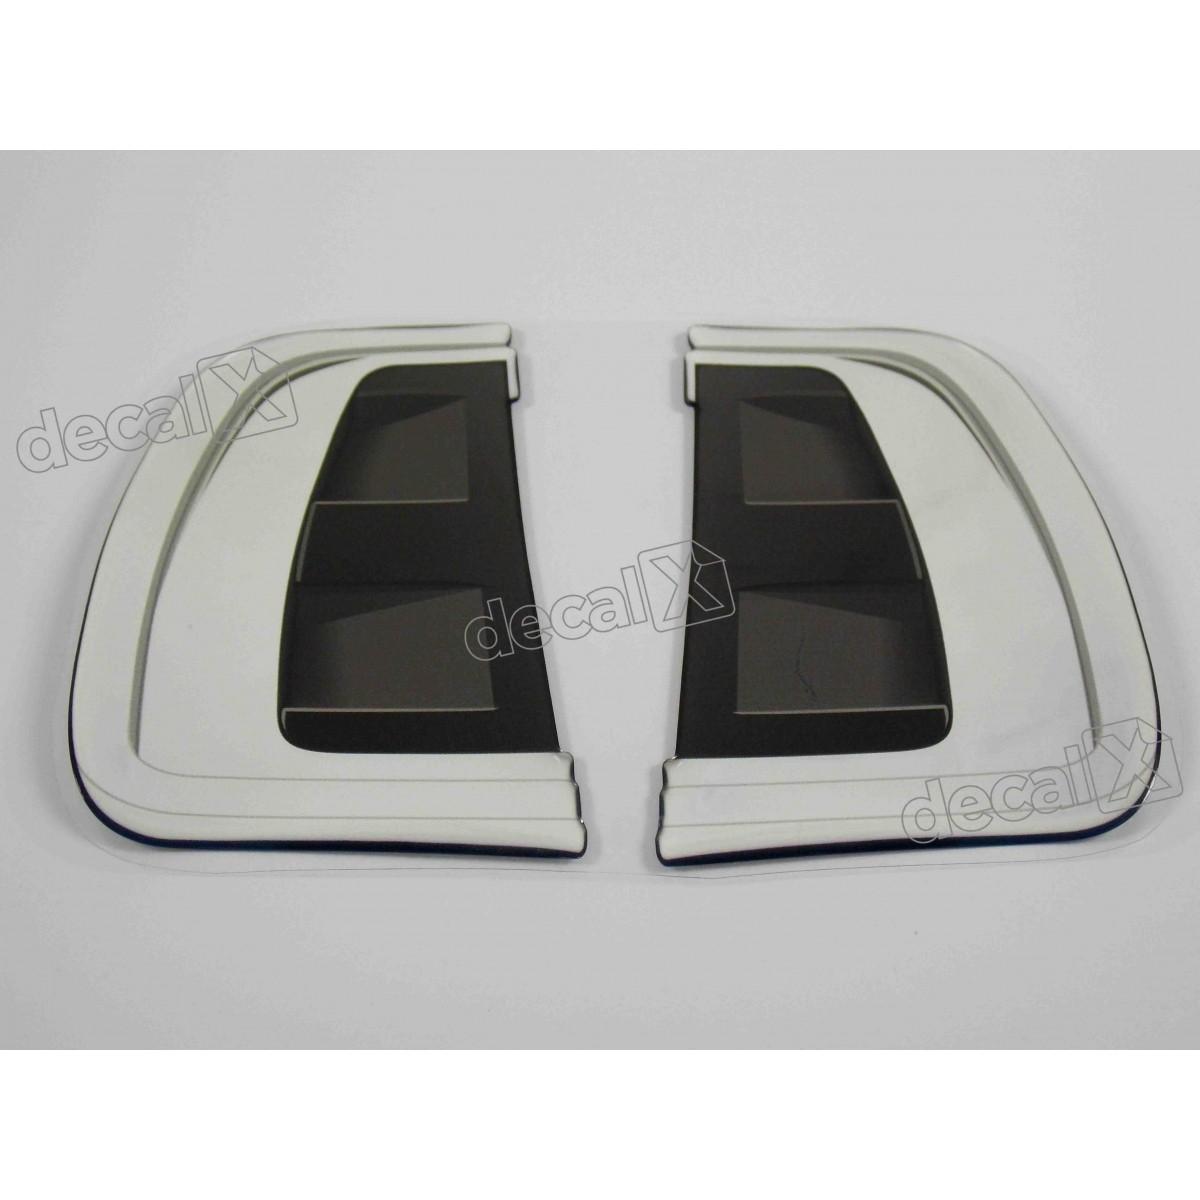 Adesivo Paralama Toyota Hilux Resinado Par01